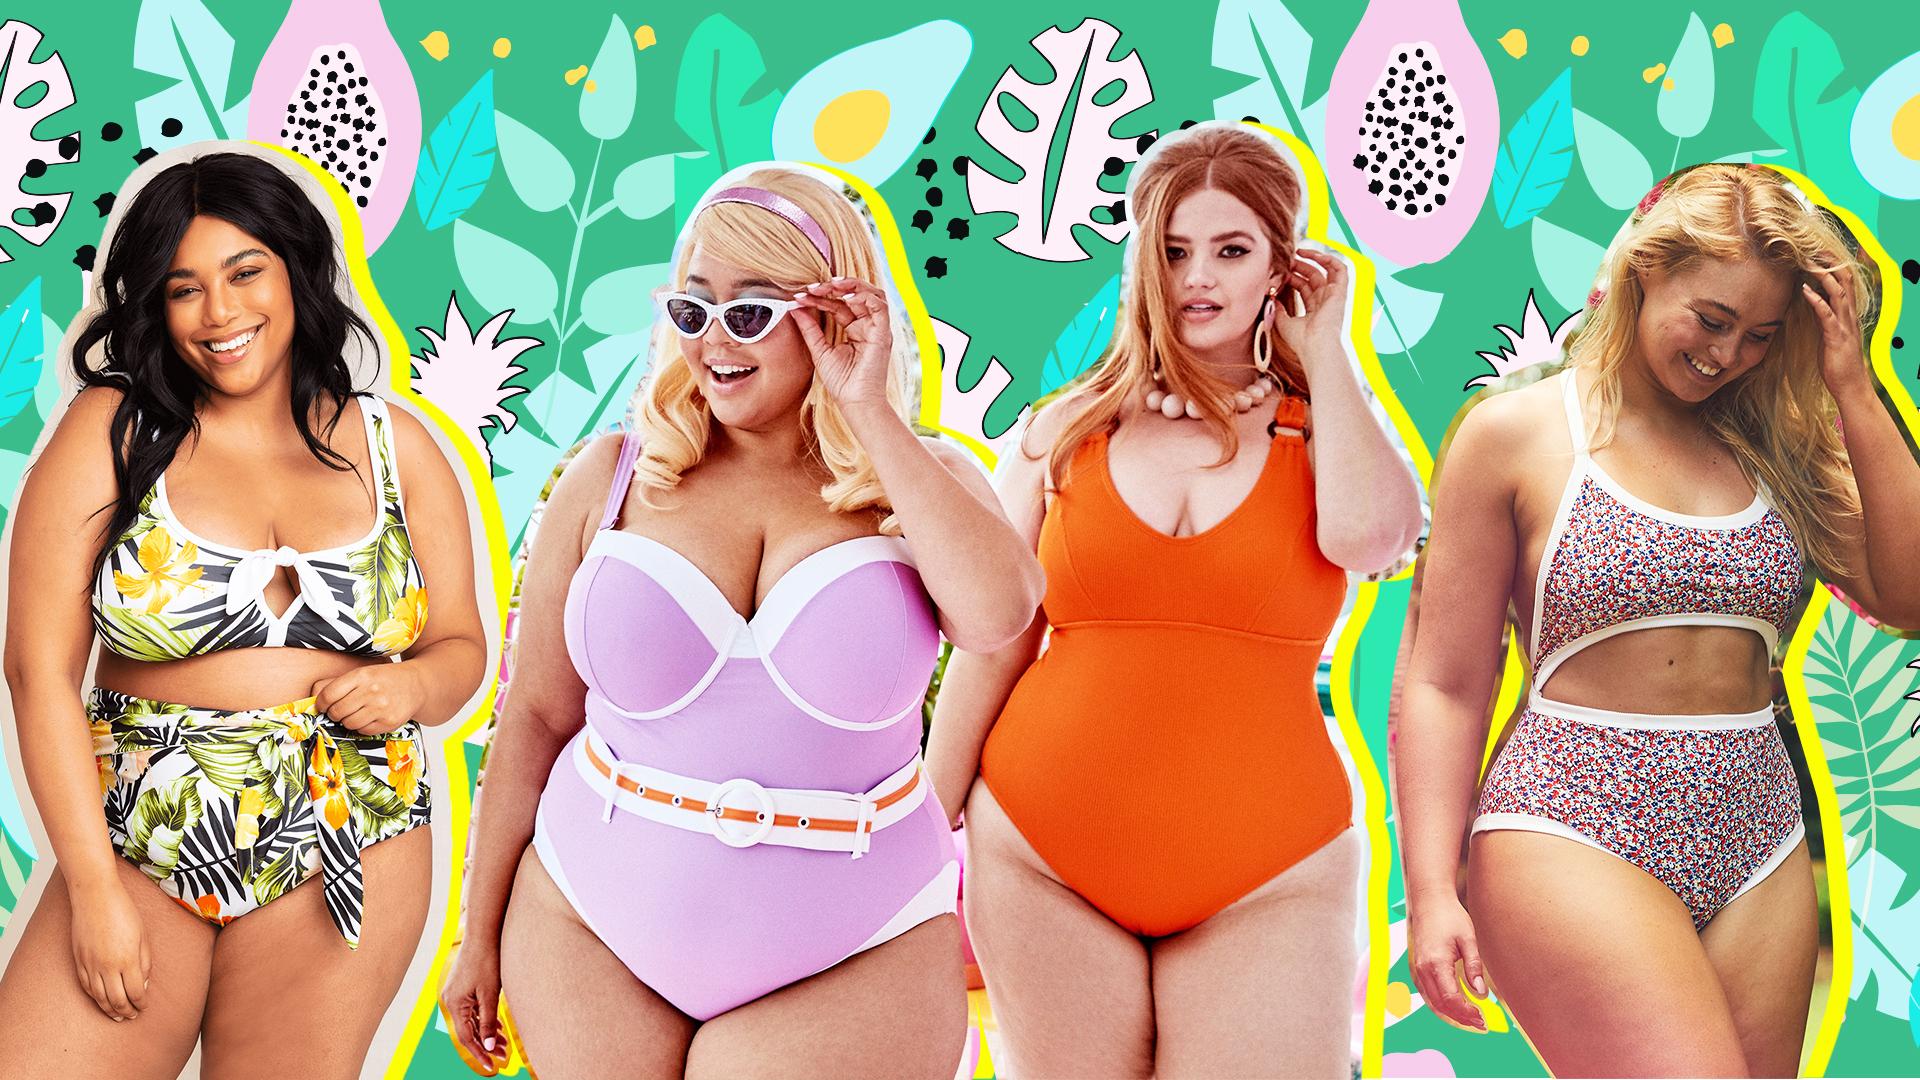 Plus Size Swimwear 2019 Body Positive Swim Suits For Every Body Type Sheknows